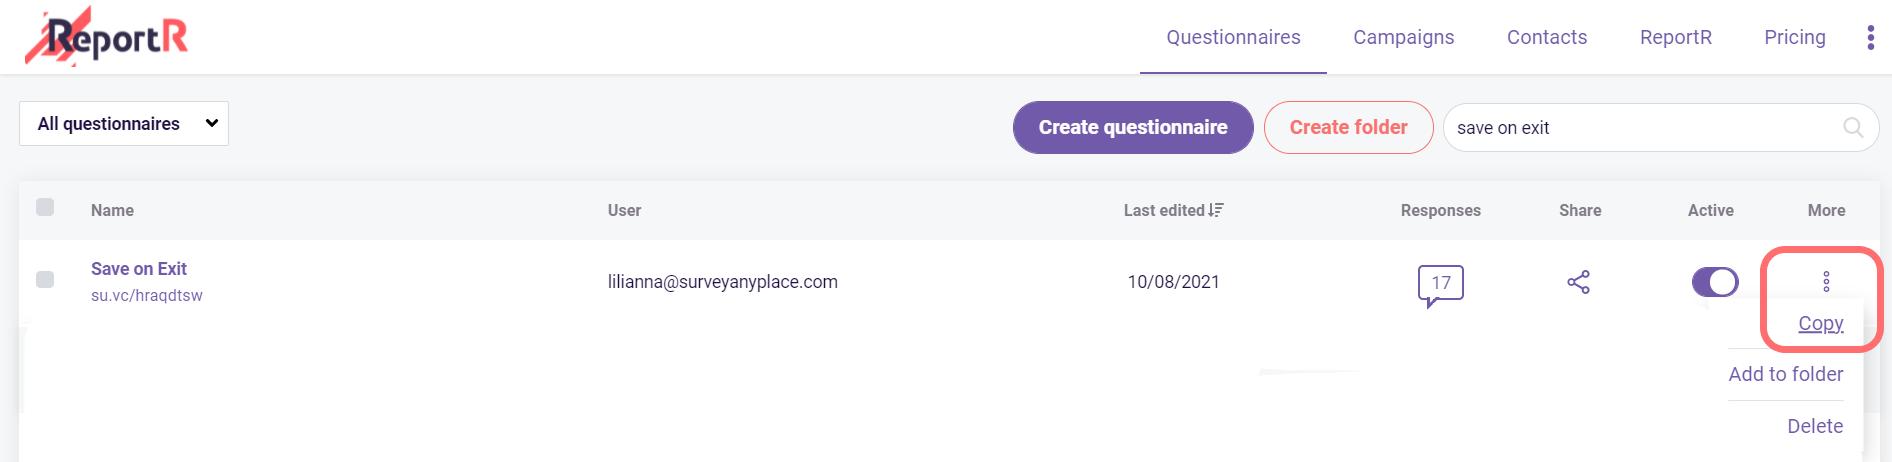 how to copy your questionnaire- copy questionnaire